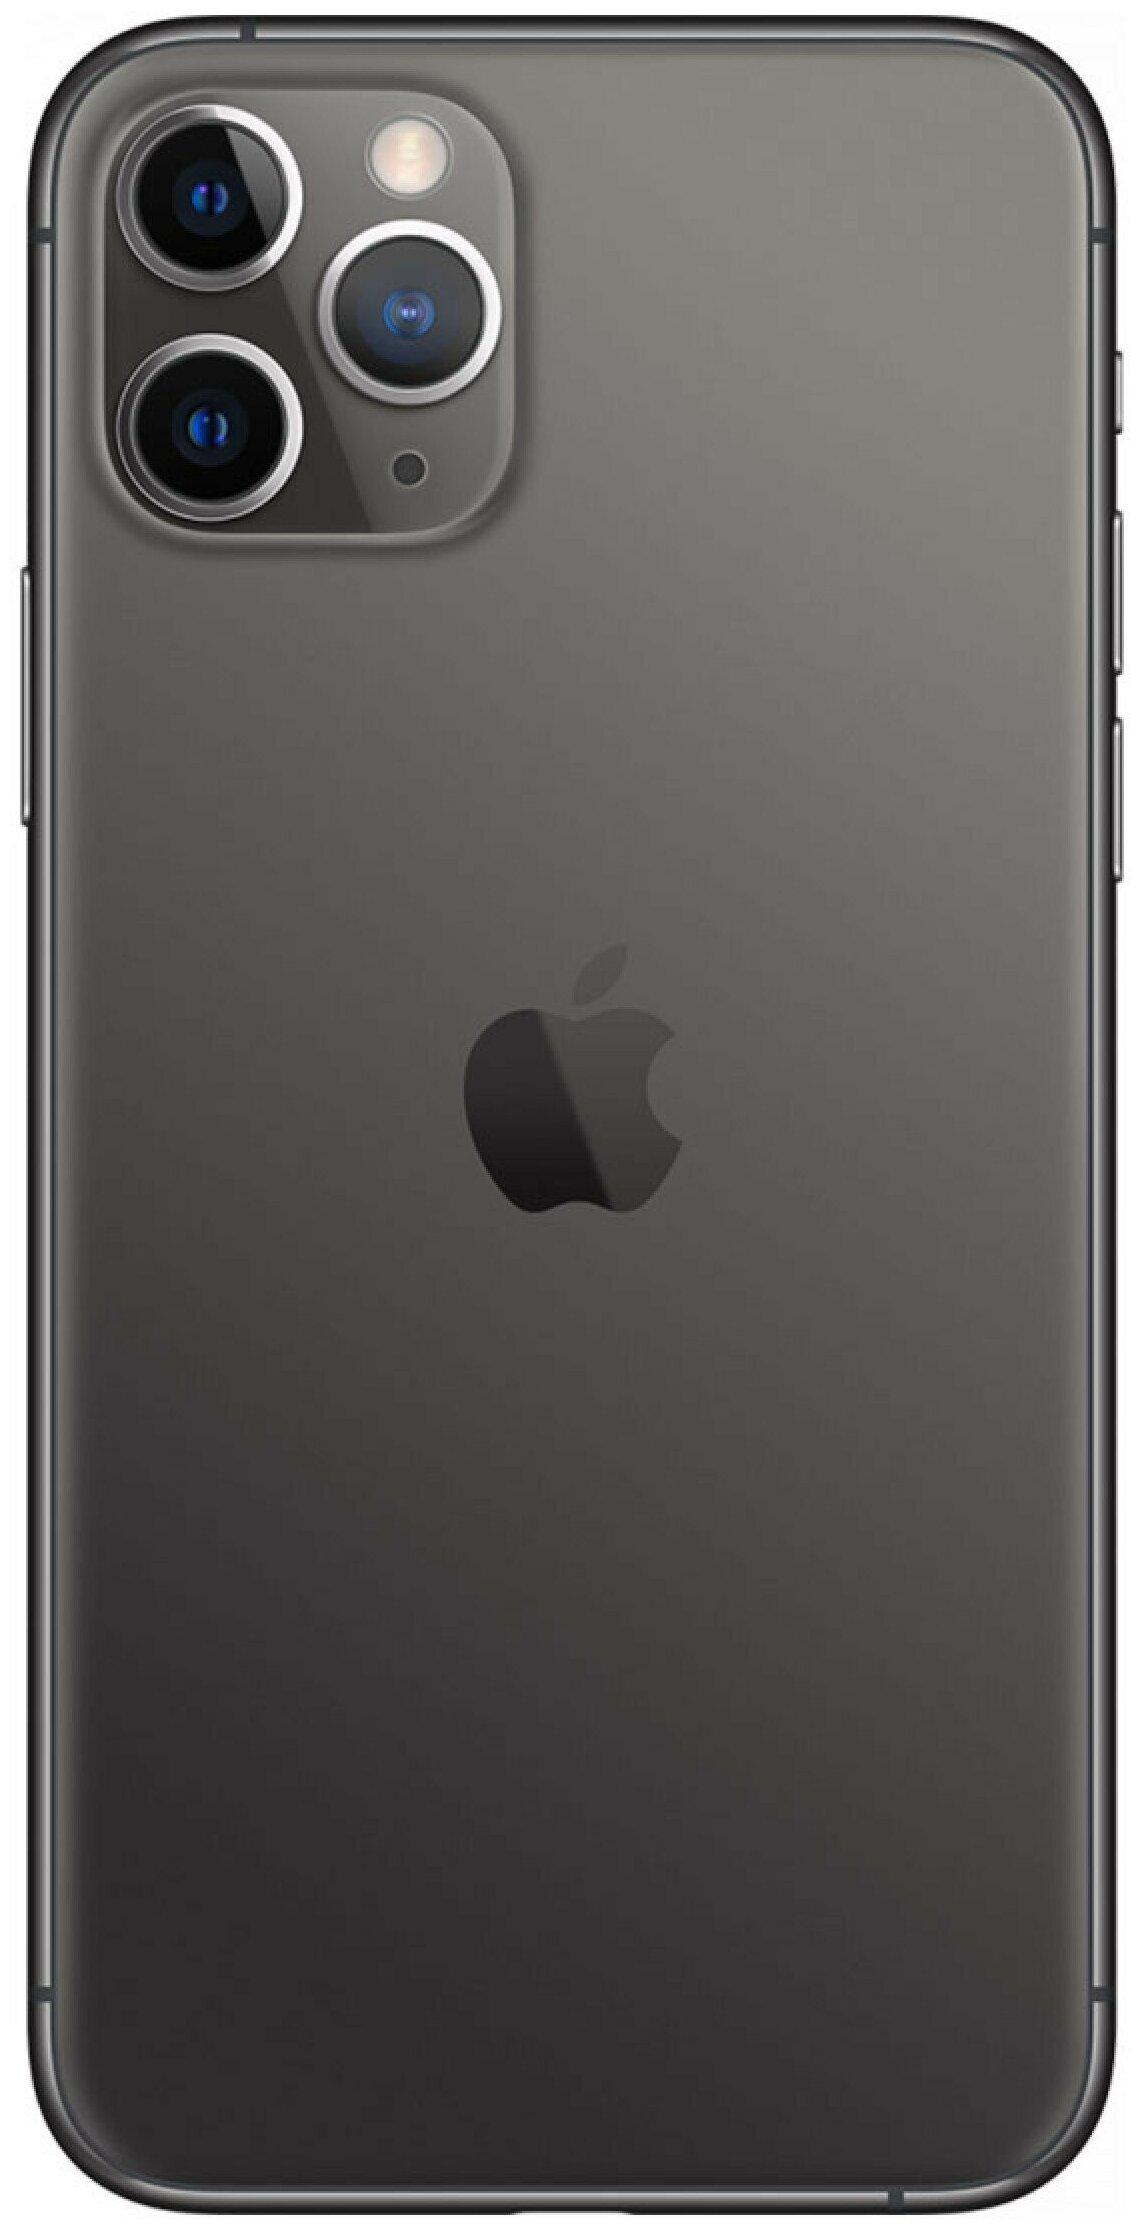 Apple iPhone 11 Pro Max 512GB - процессор: Apple A13Bionic